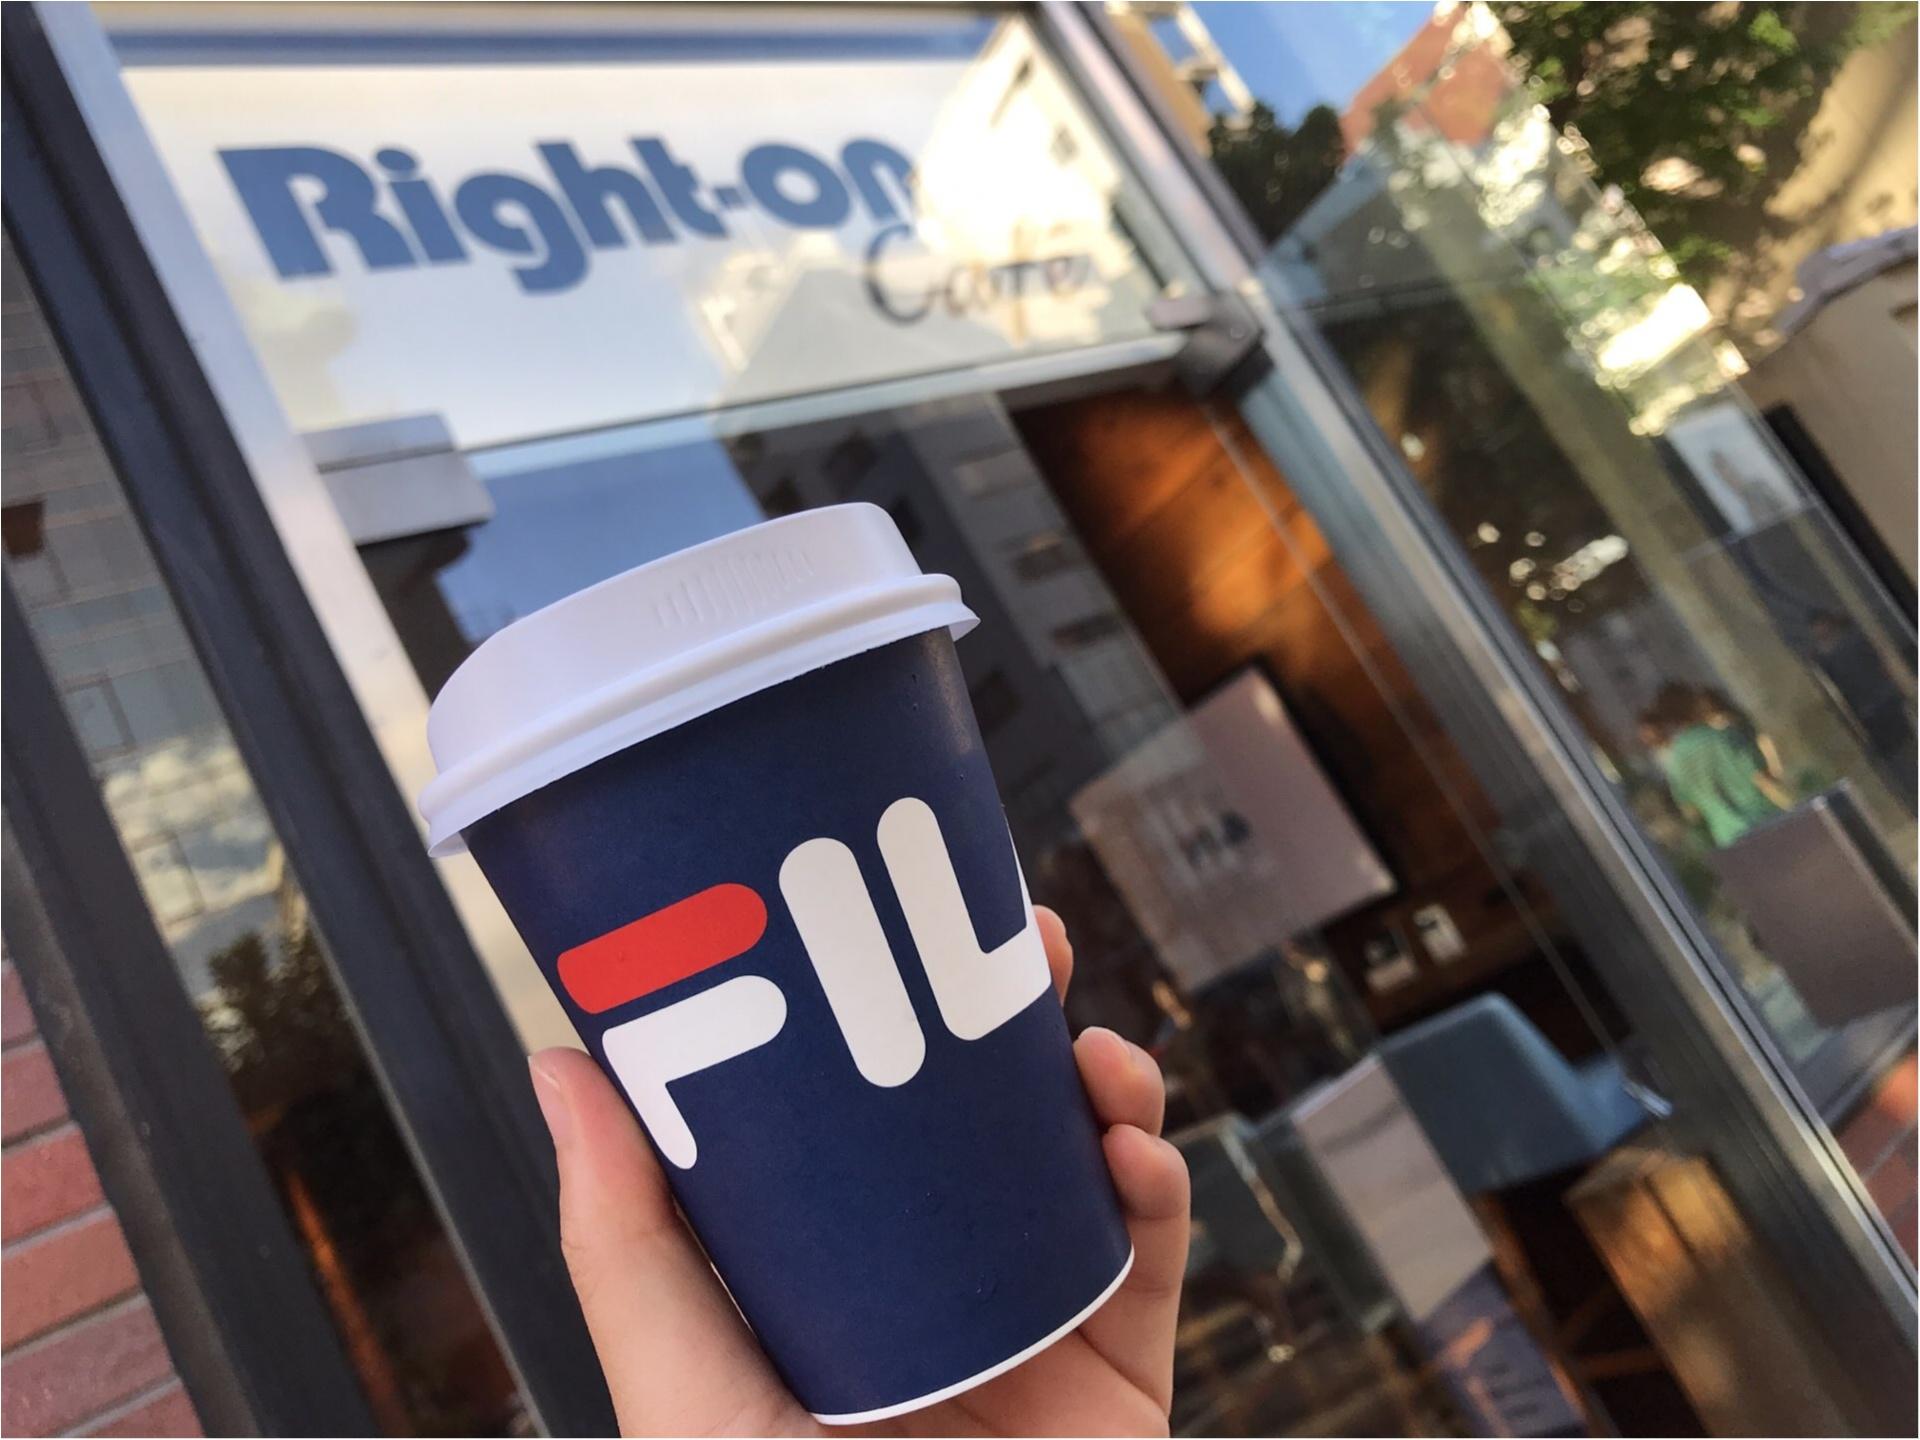 【FILA(フィラ)】がRight-onをジャック!?POP-UPSHOP&CAFEがオープン★_4